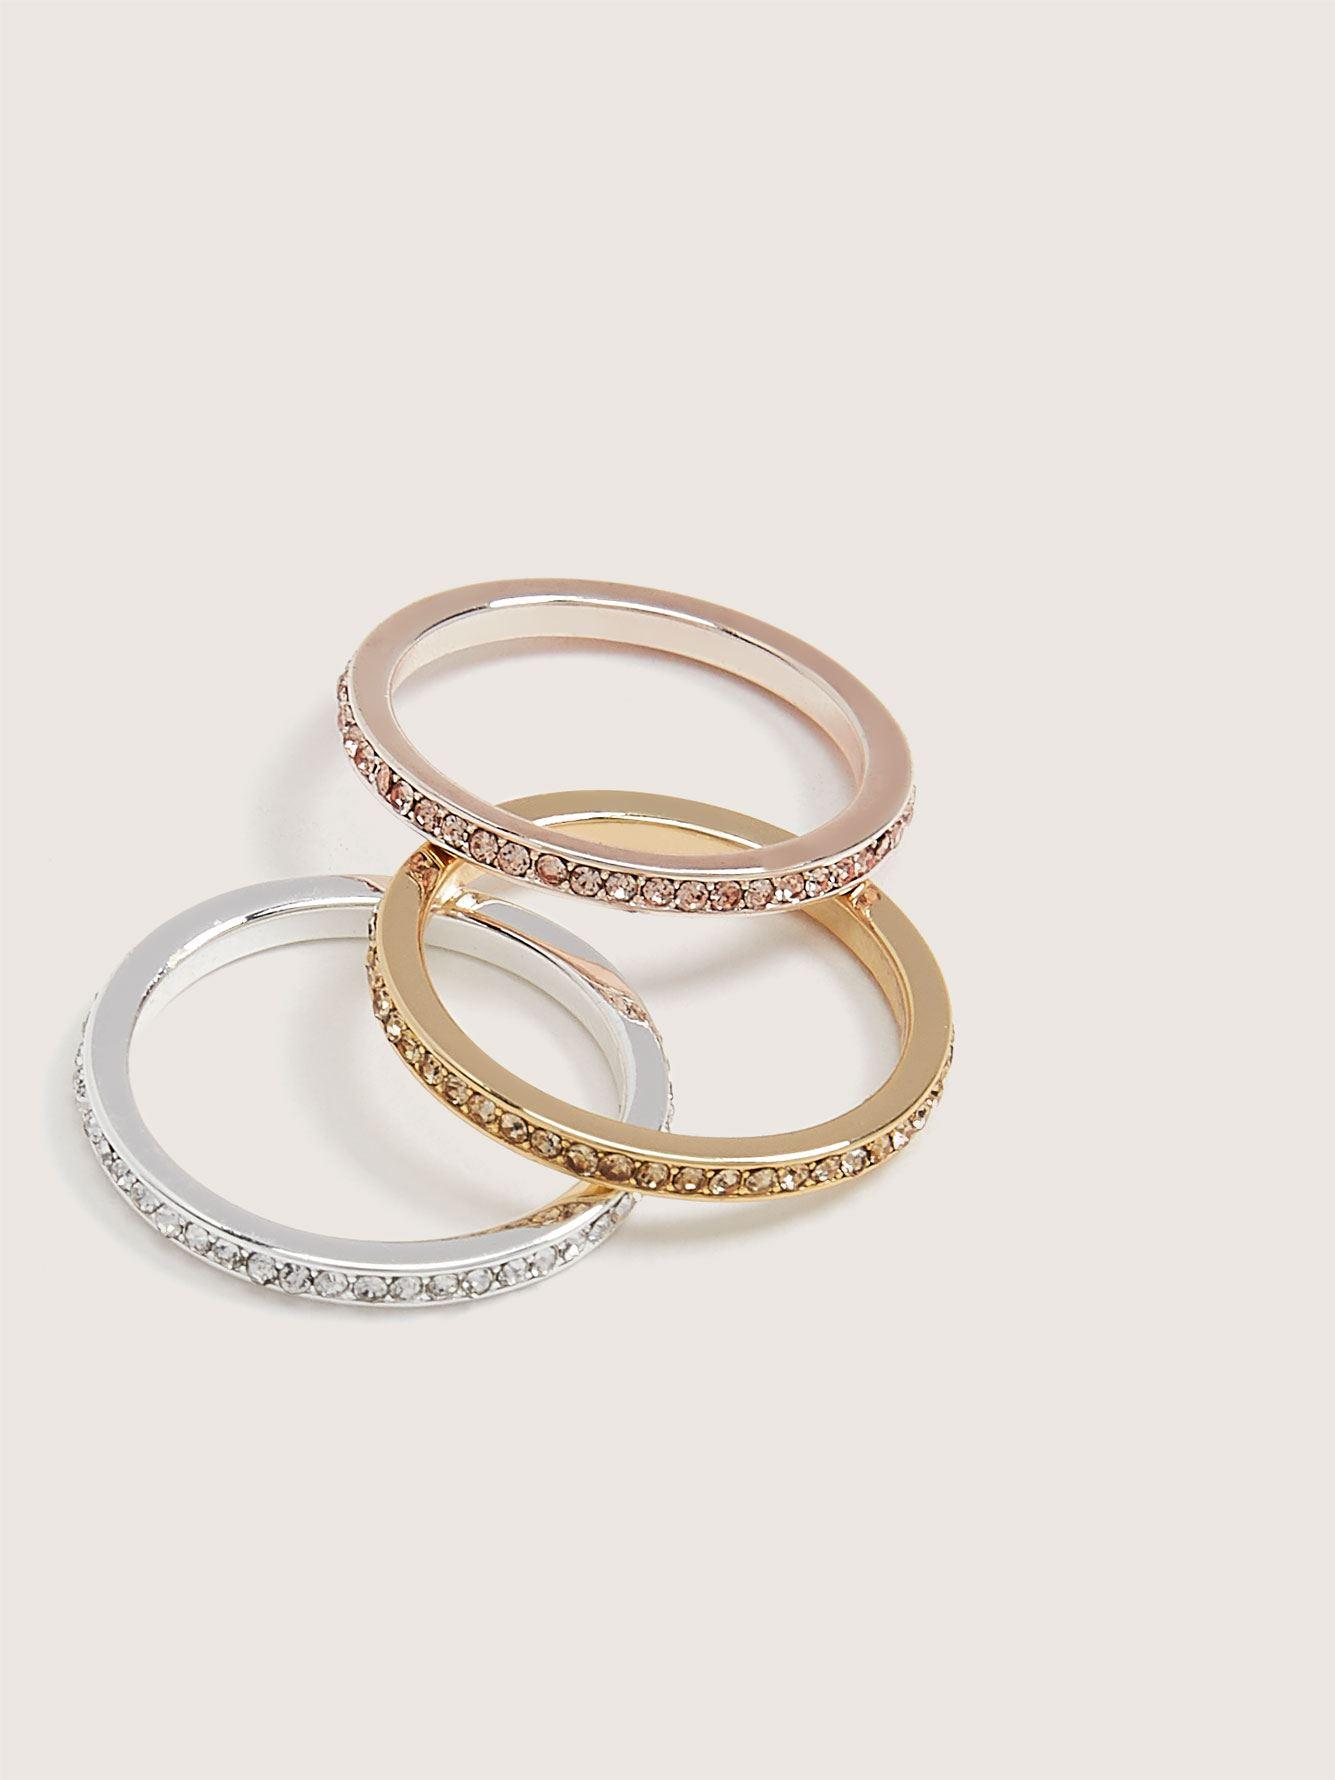 Rhinestone Rings, 3-Pack - Addition Elle